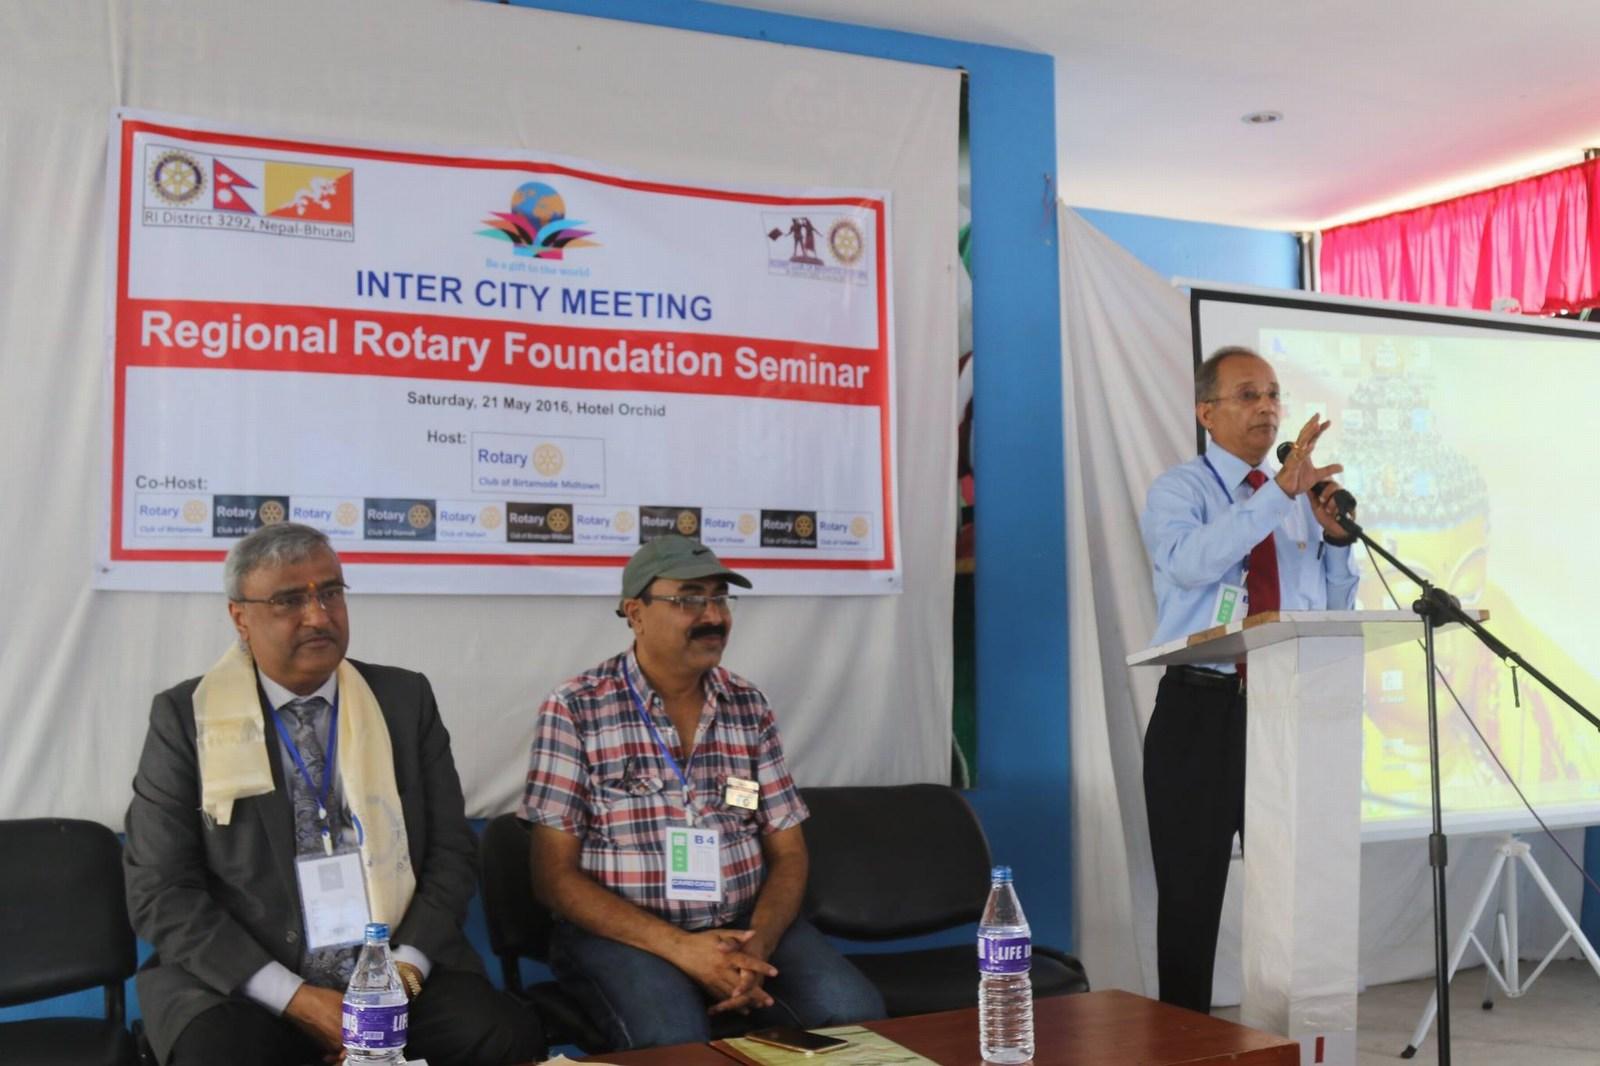 Regional-Rotary-Foundation-Seminar-Intercity-Meeting-Rotary-Club-of-Kakarvitta-18